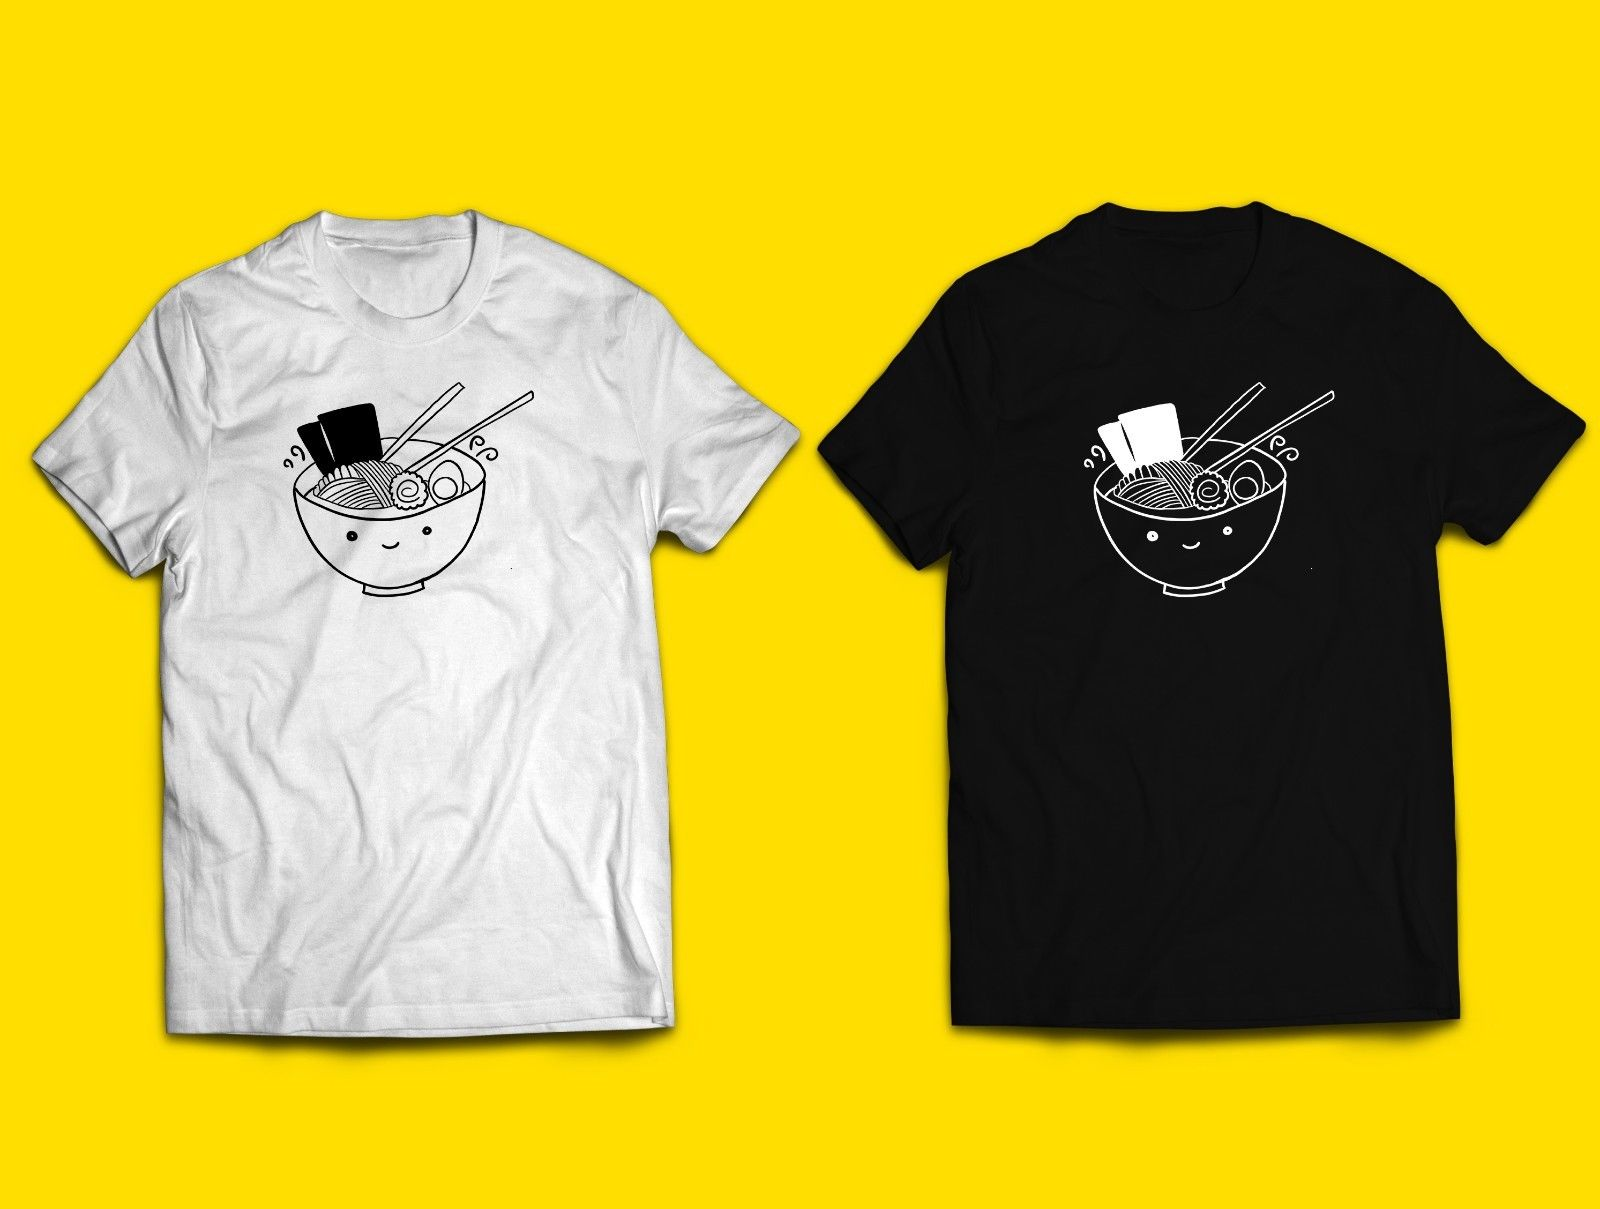 Ramen camiseta japonesa comida Kawaii niños adultos mujeres Unisex Noodle lindo dibujo animado minimalista camiseta hombres Unisex nueva moda